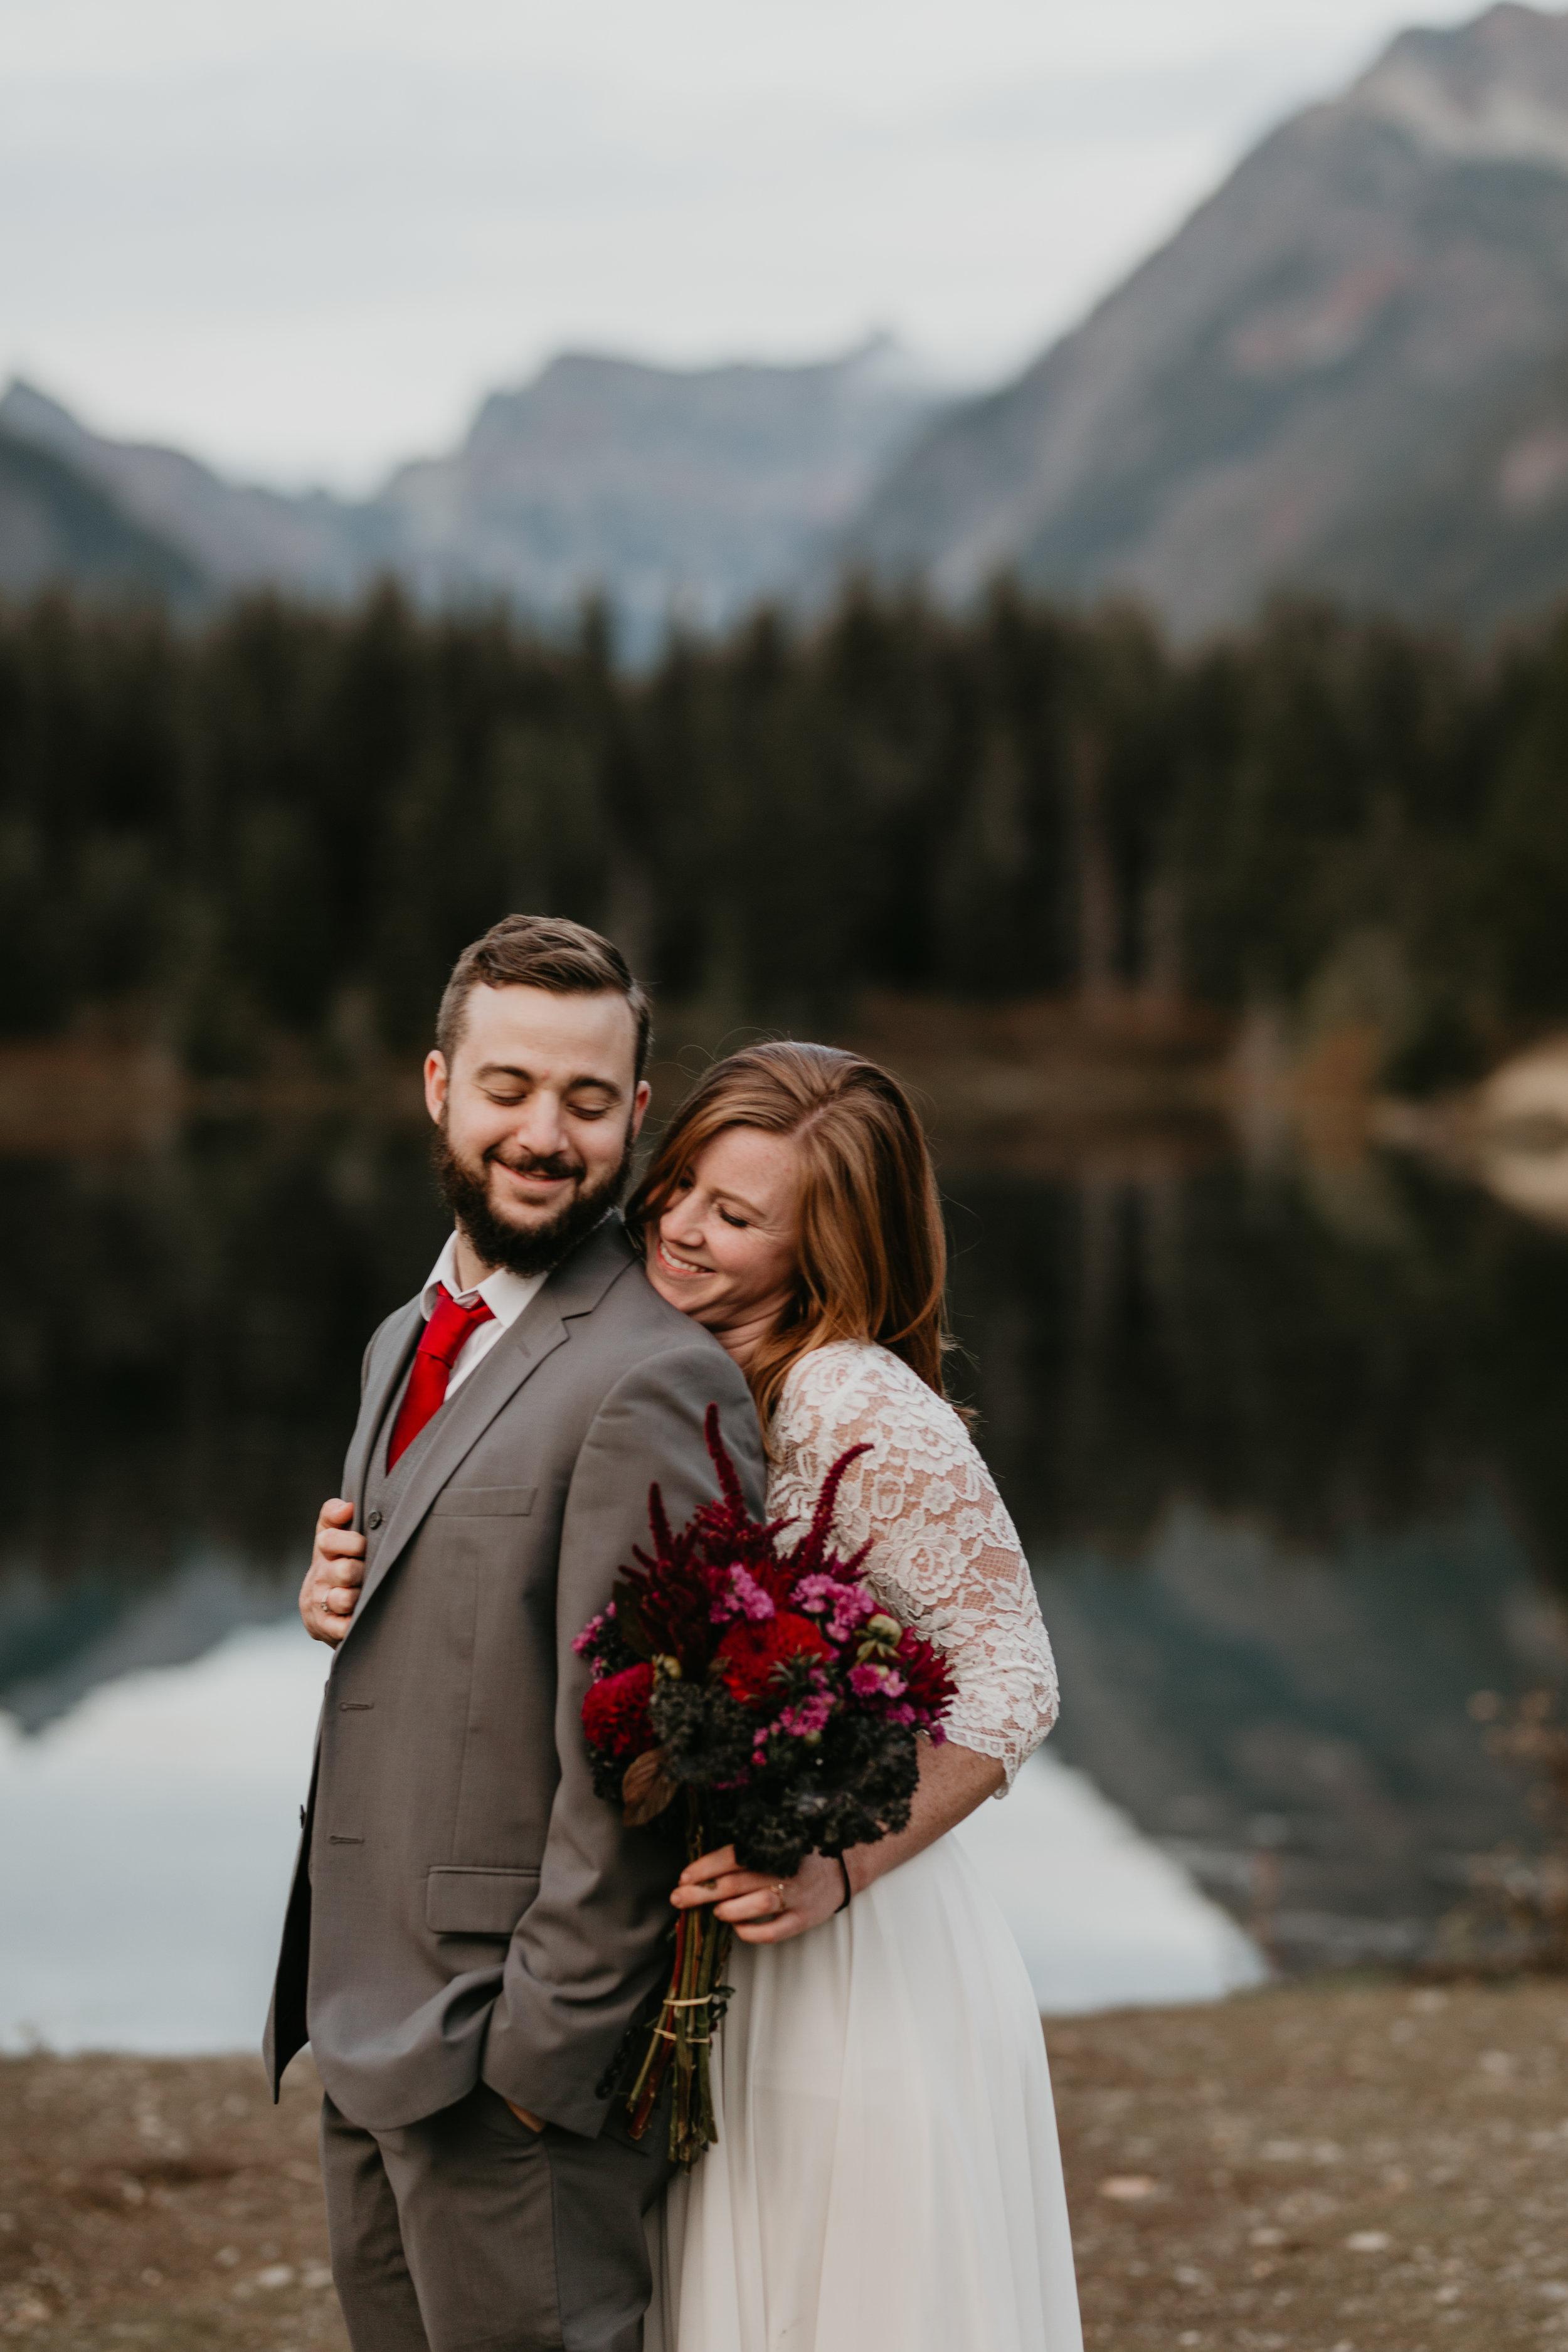 nicole-daacke-photography-mountain-view-elopement-at-gold-creek-pond-snoqualmie-washington-wa-elopement-photographer-photography-adventure-elopement-in-washington-fall-lakeside-golden-sunset-boho-fun-bride-2843.jpg